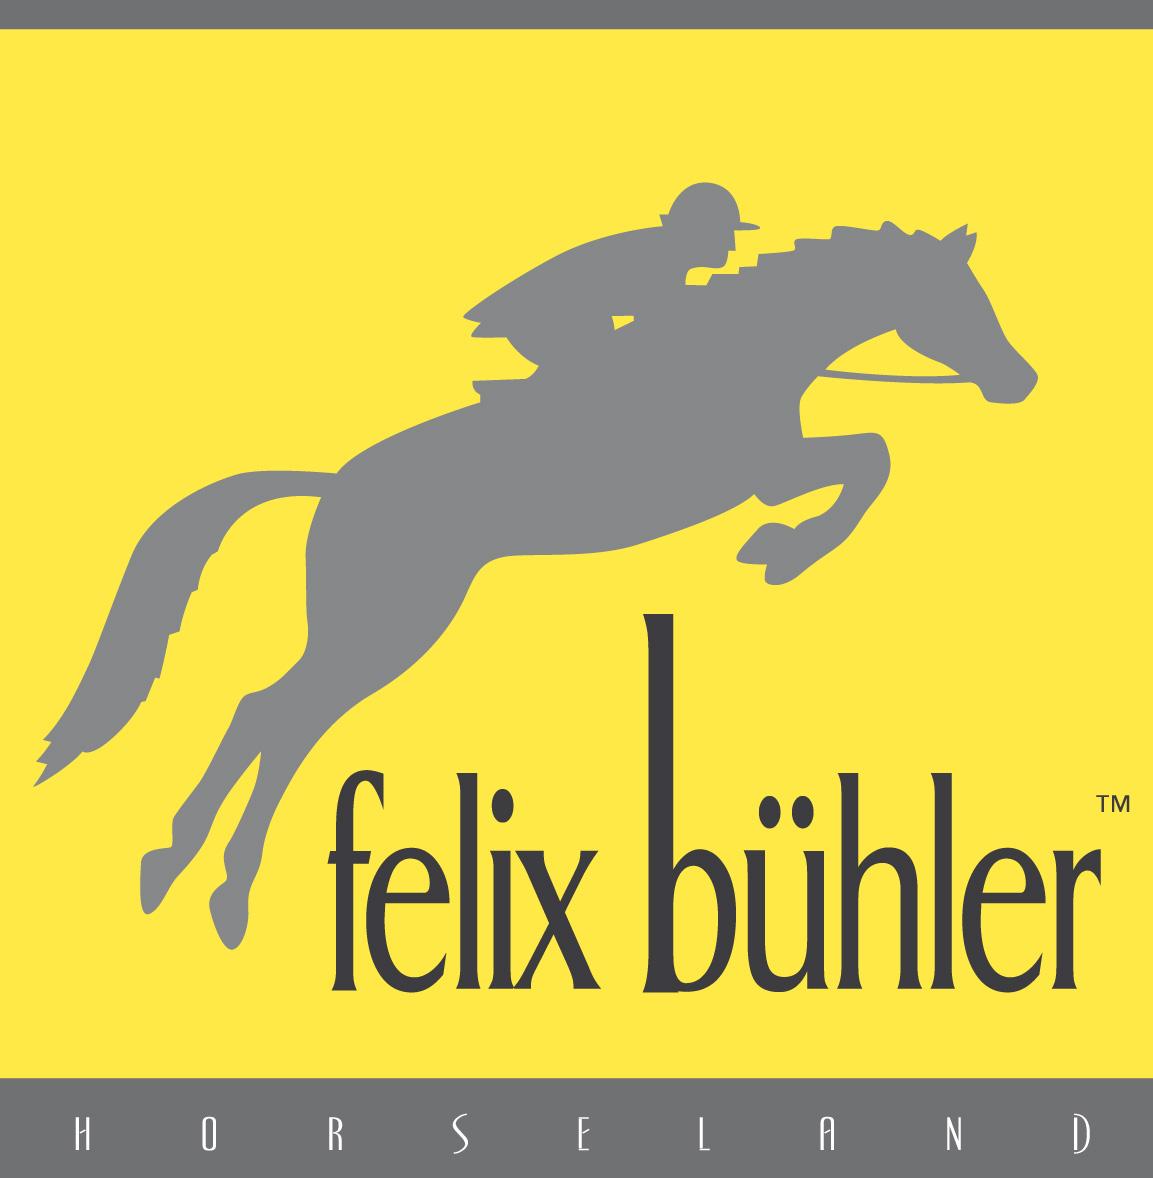 felix_buehler_logo